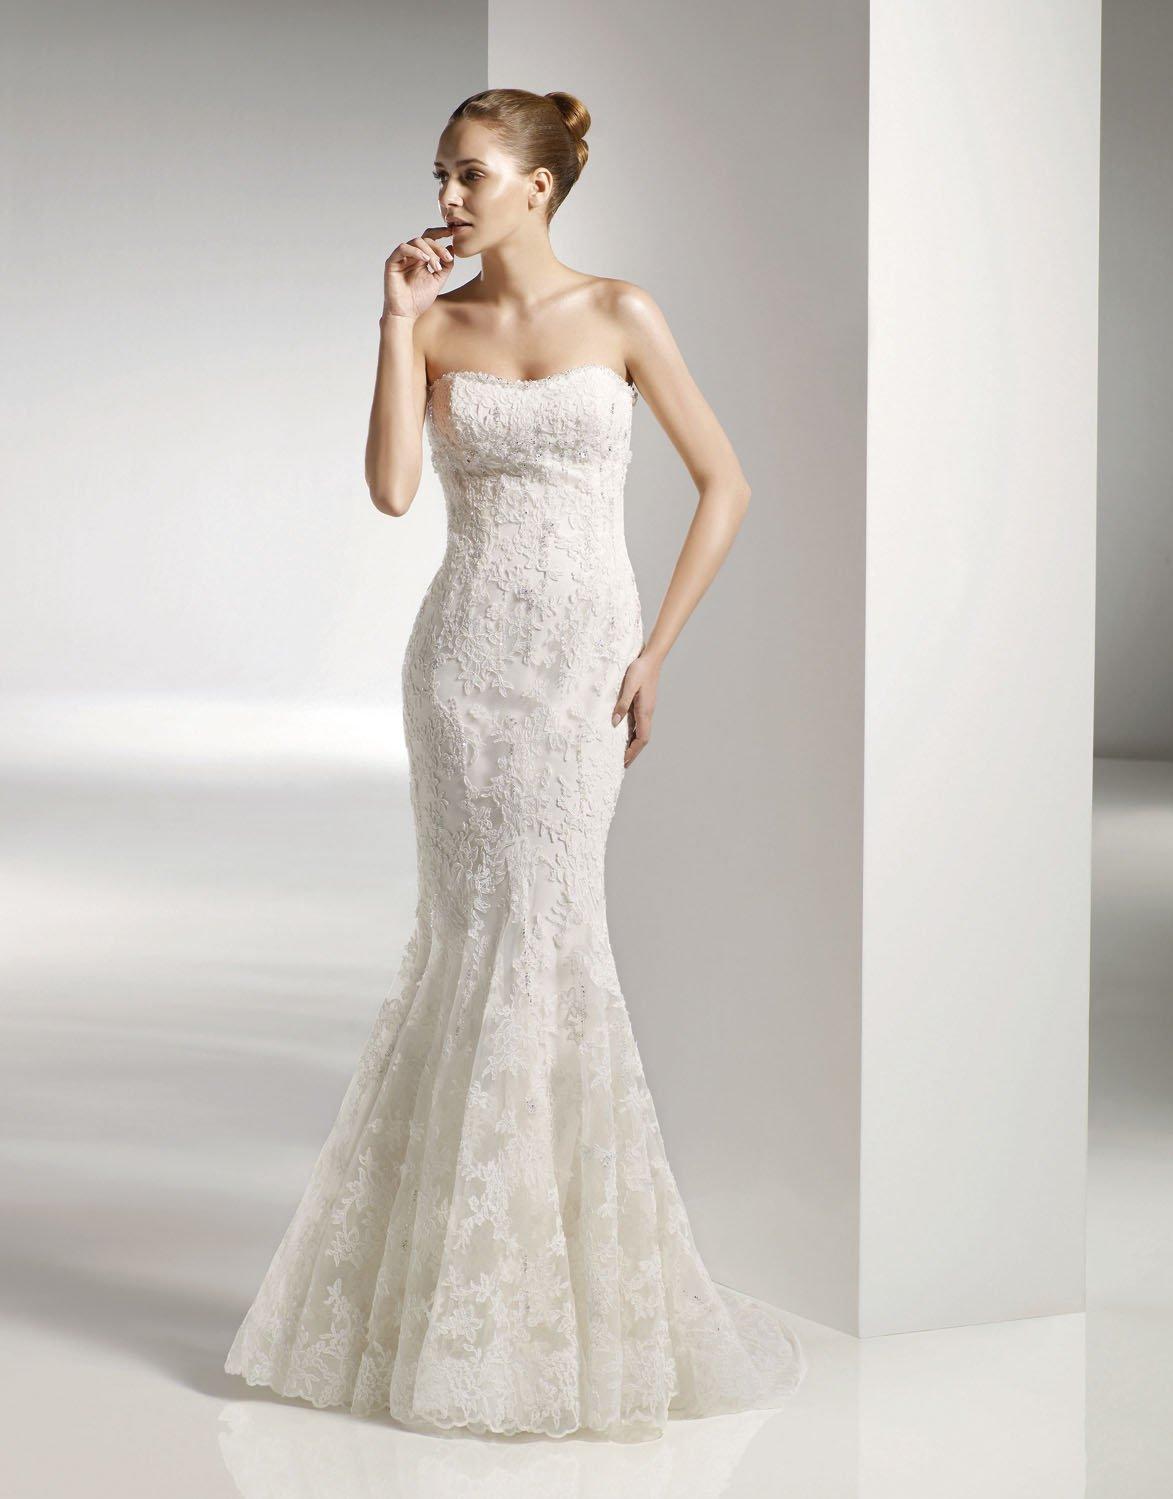 Mermaid Scoop Neckline Appliqued Beading Wedding Dress Bridal Gown aq0038